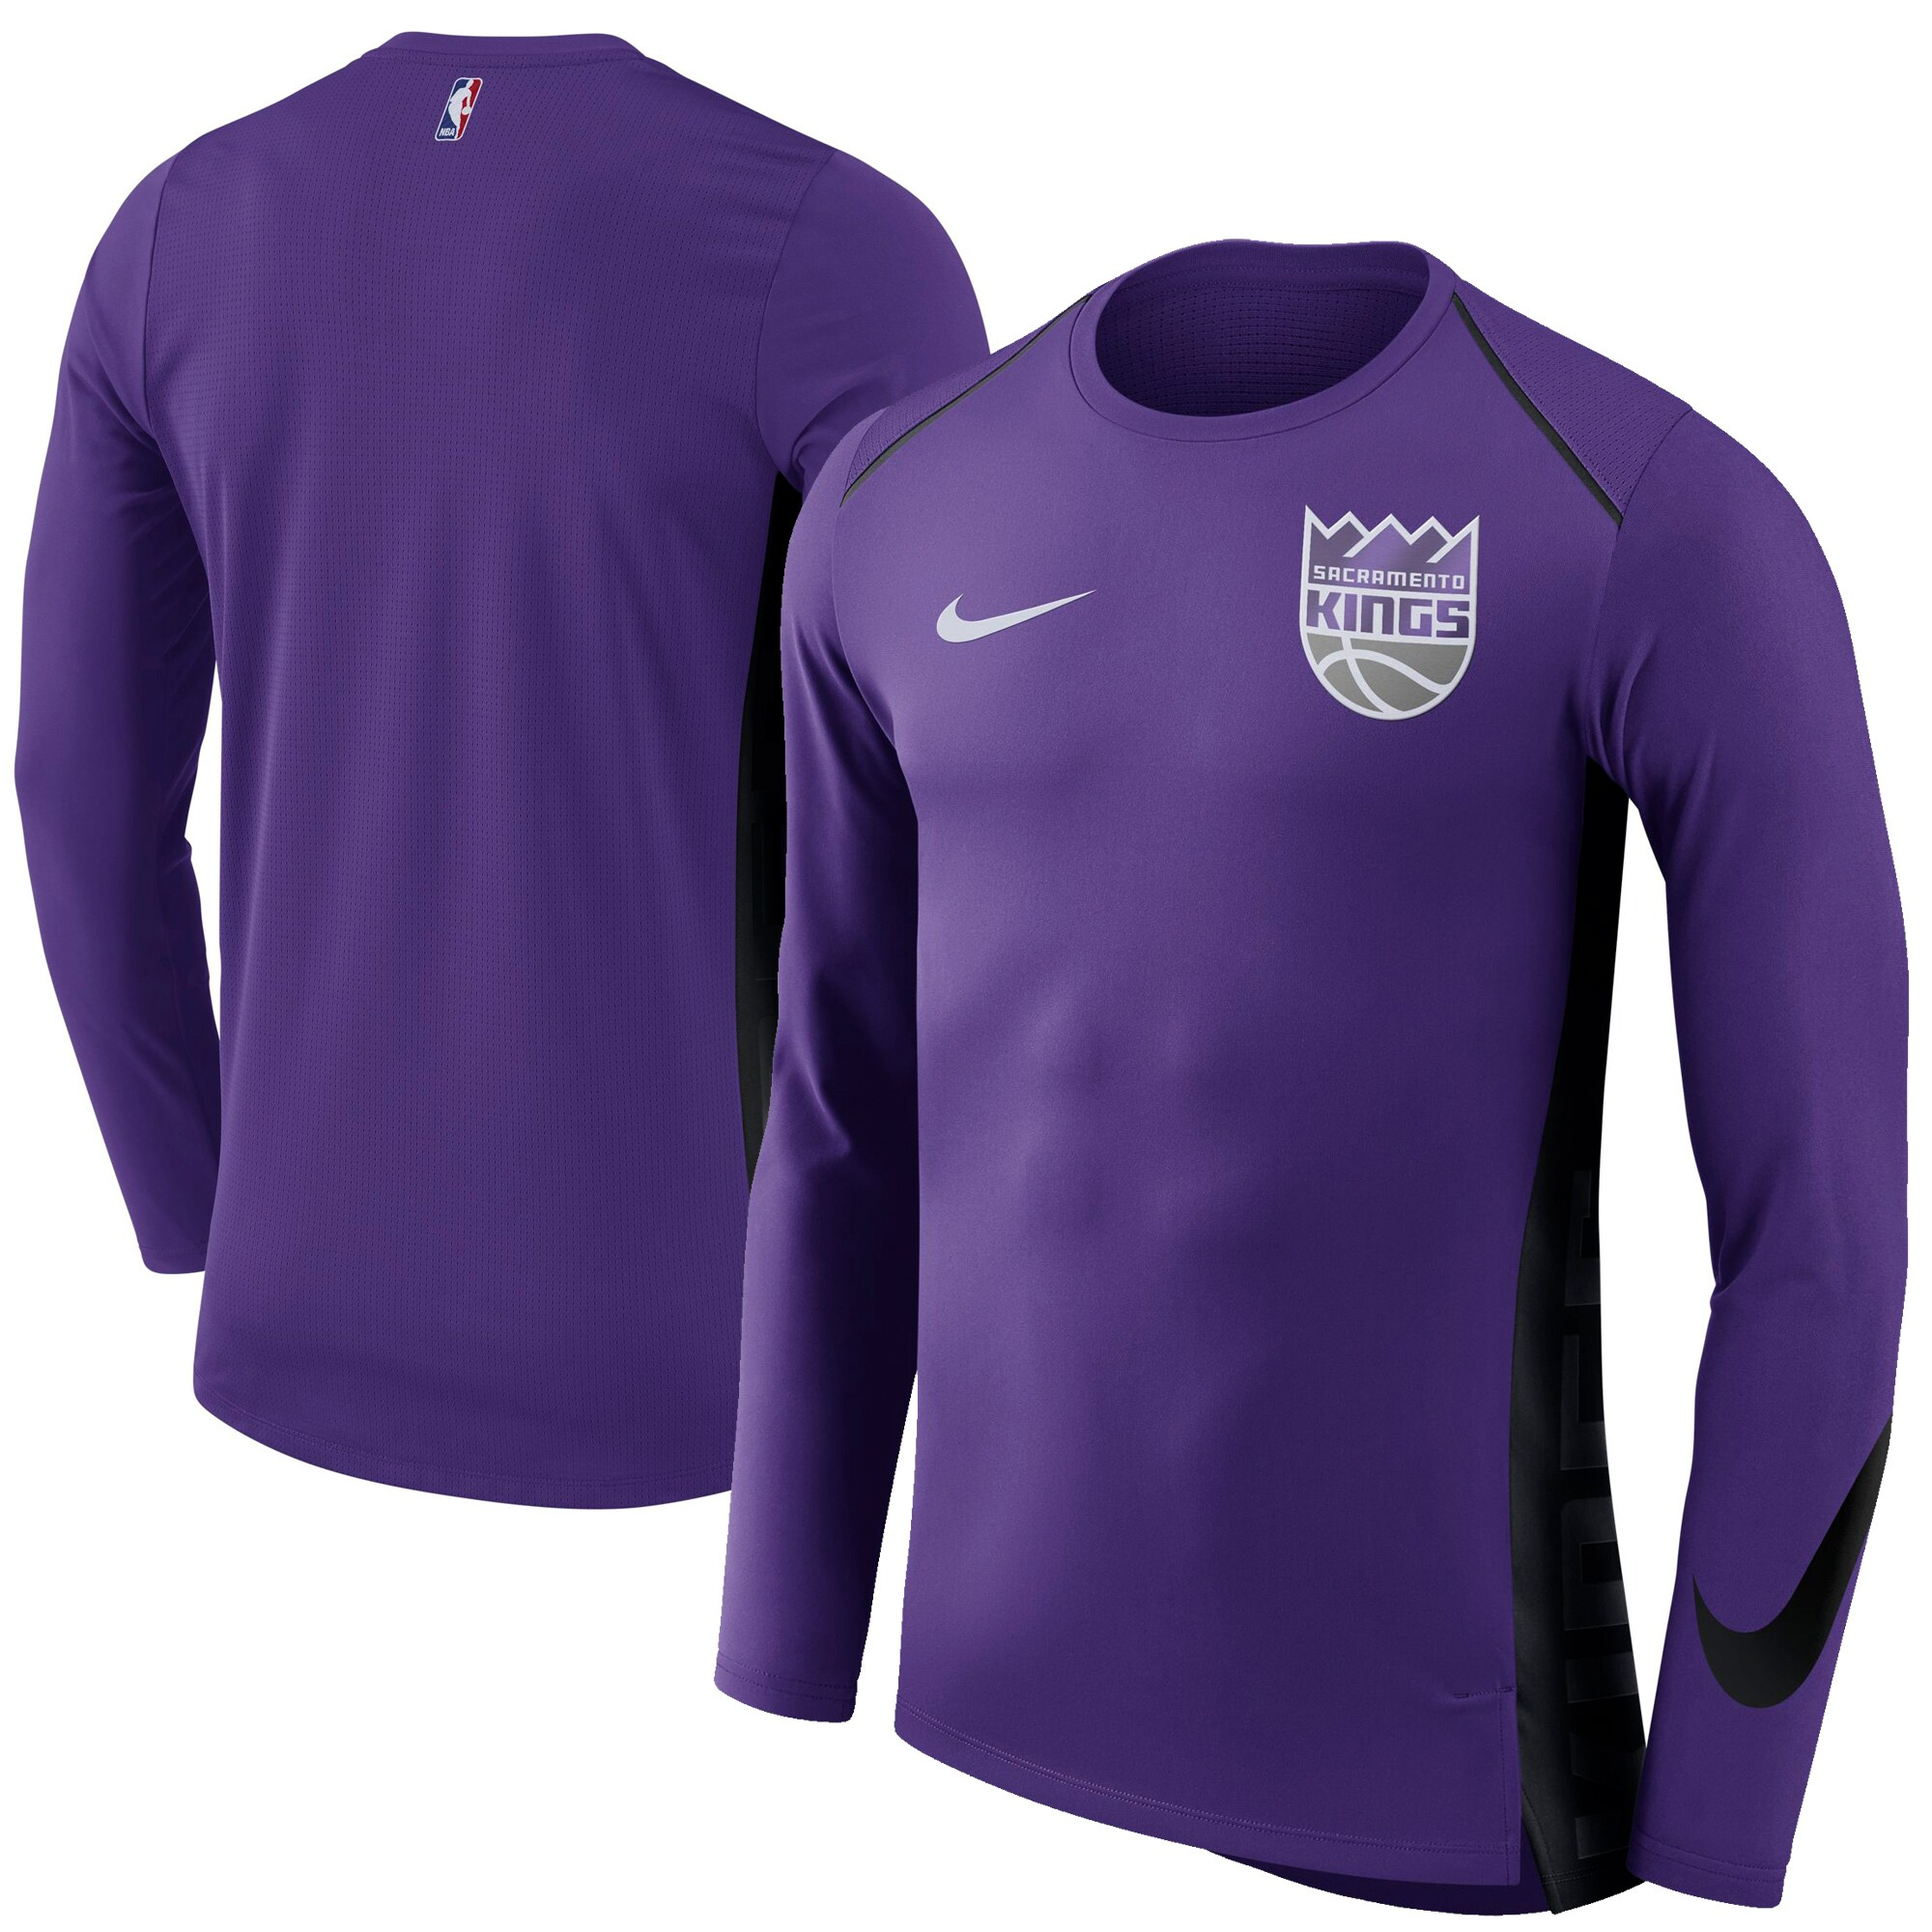 Sacramento Kings Nike Elite Shooter Performance Long Sleeve T-Shirt - Purple